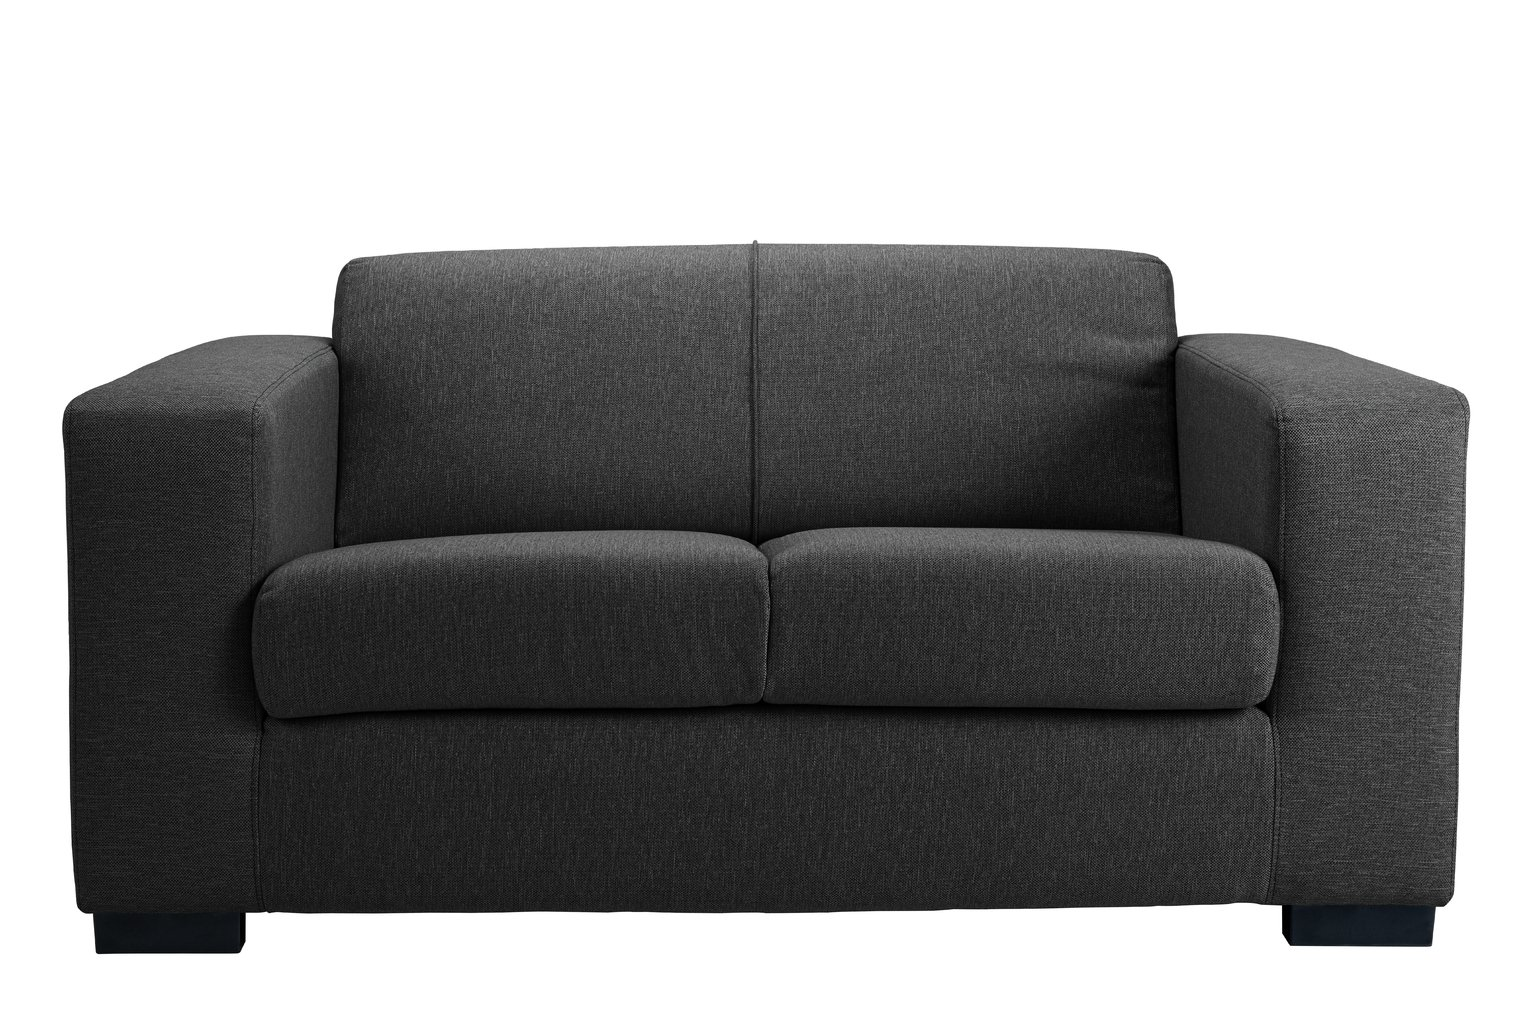 Argos Home Ava Compact 2 Seater Fabric Sofa - Charcoal